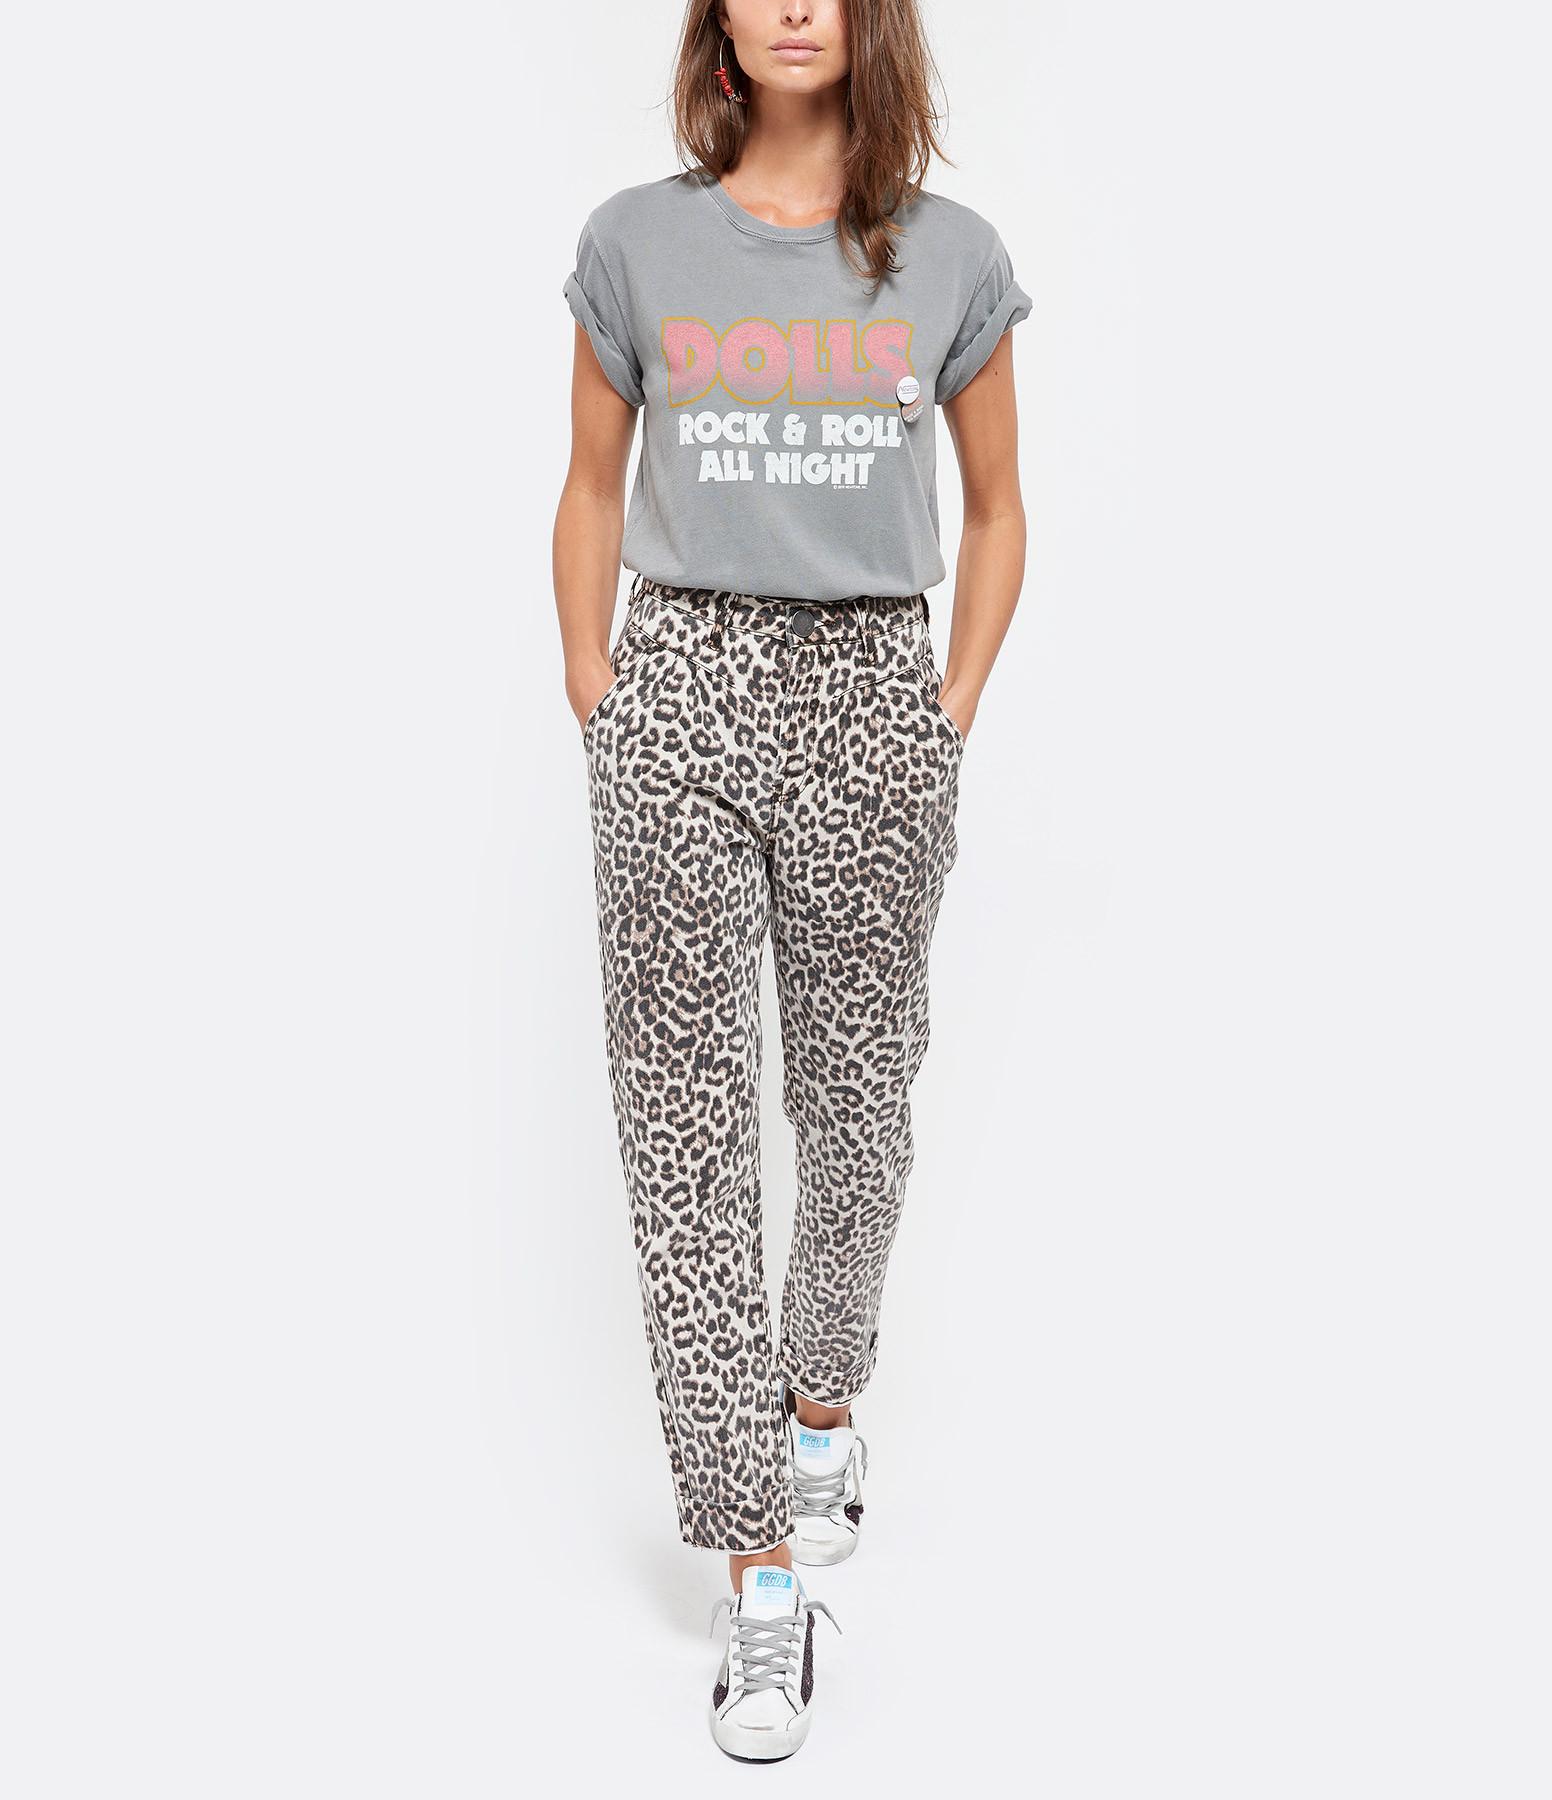 NEWTONE - Tee-shirt Dolls Coton Gris